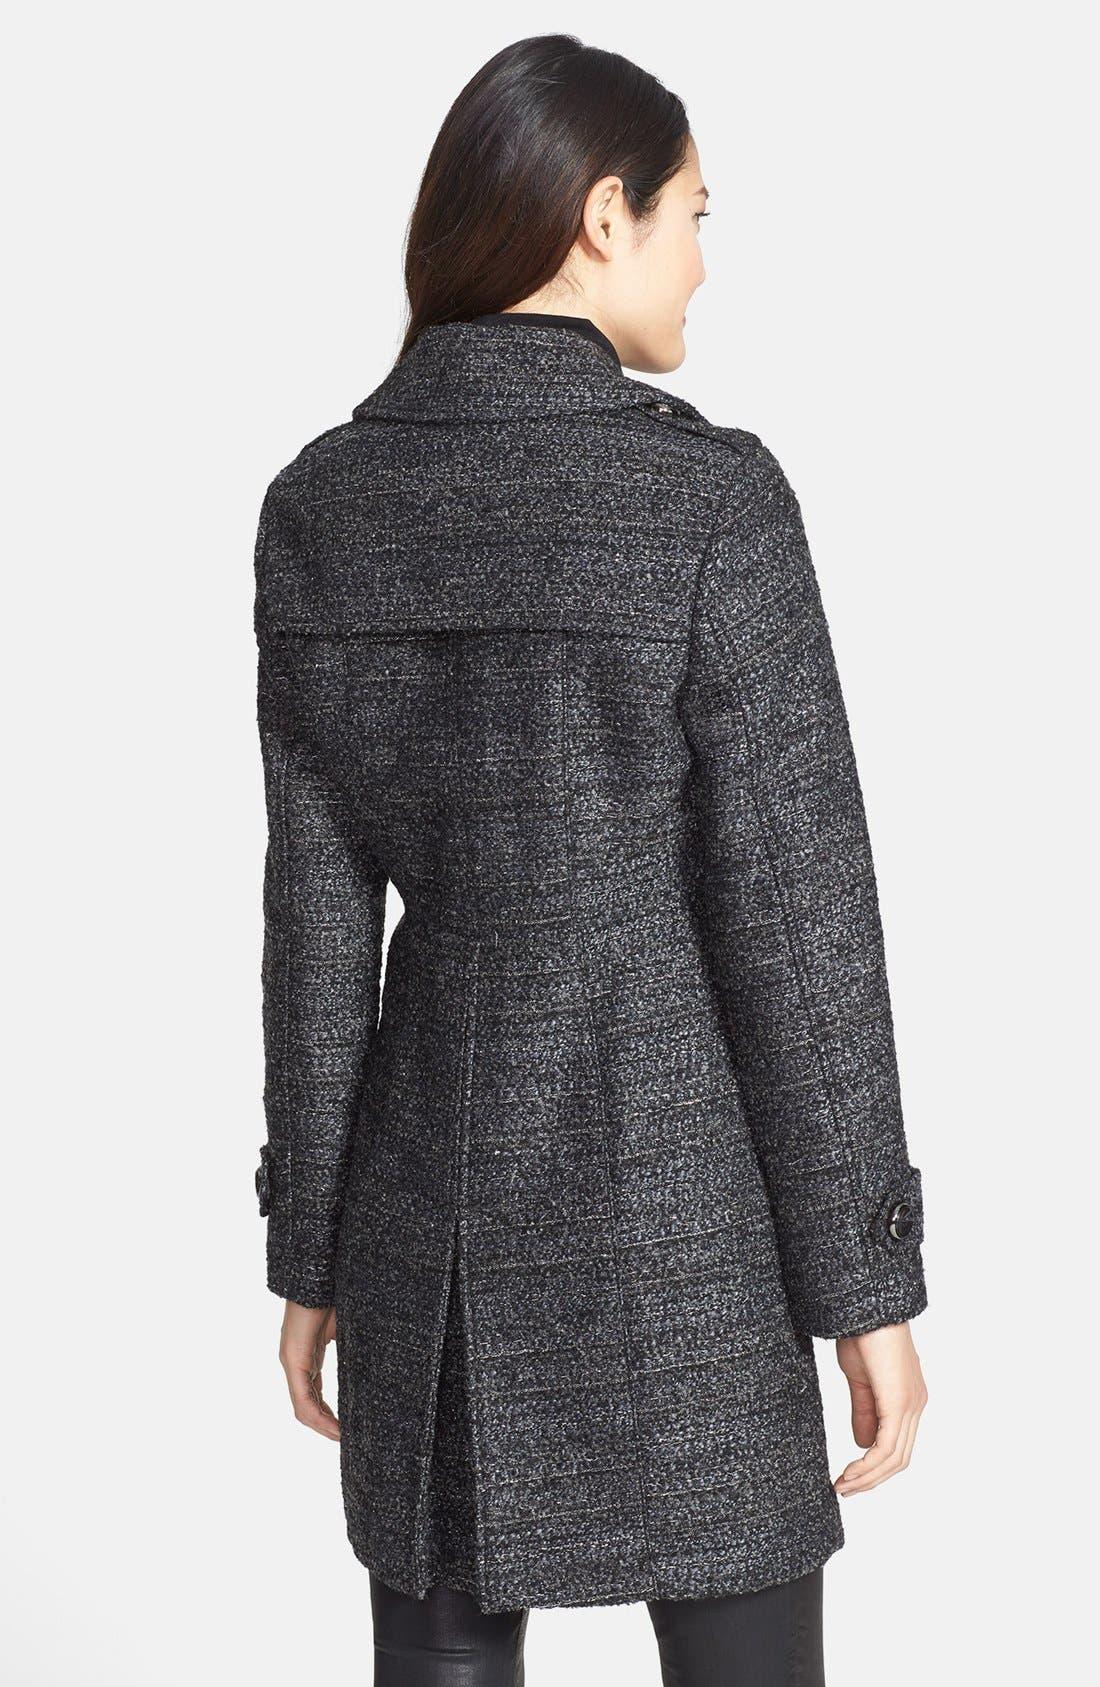 Metallic Tweed Walking Coat,                             Alternate thumbnail 2, color,                             Black